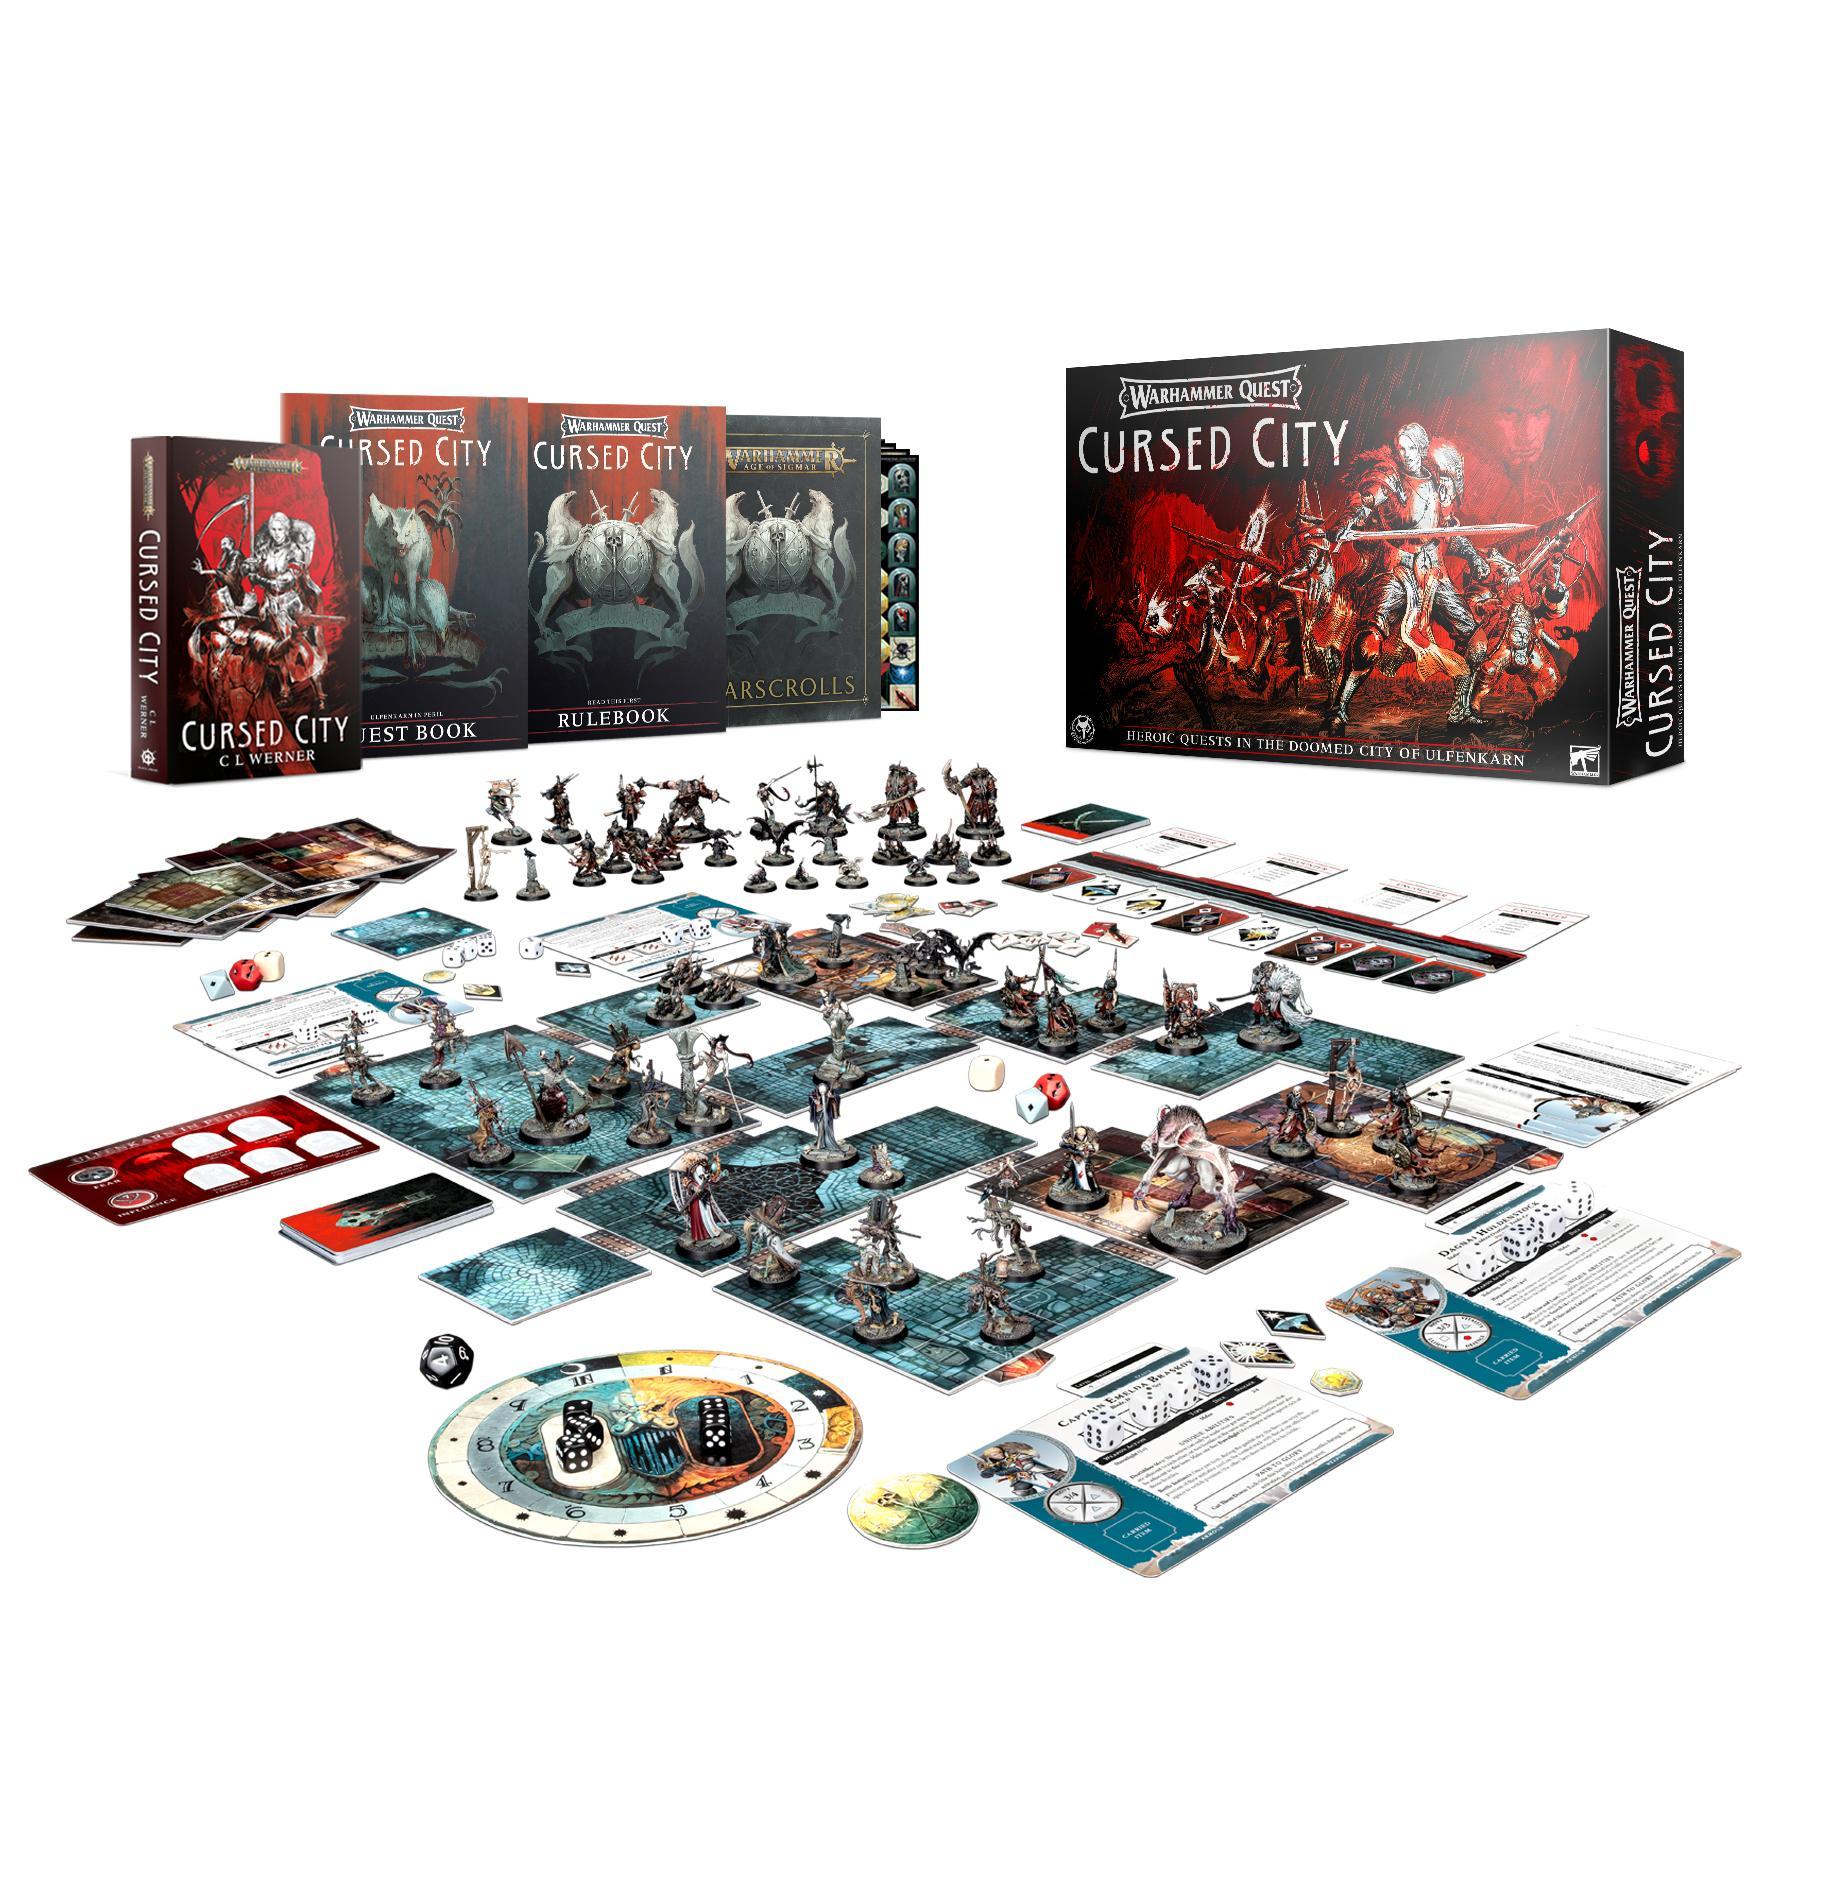 Https trade games workshop com assets 2021 04 tr wq 05 60010799011 warhammer quest cursed city